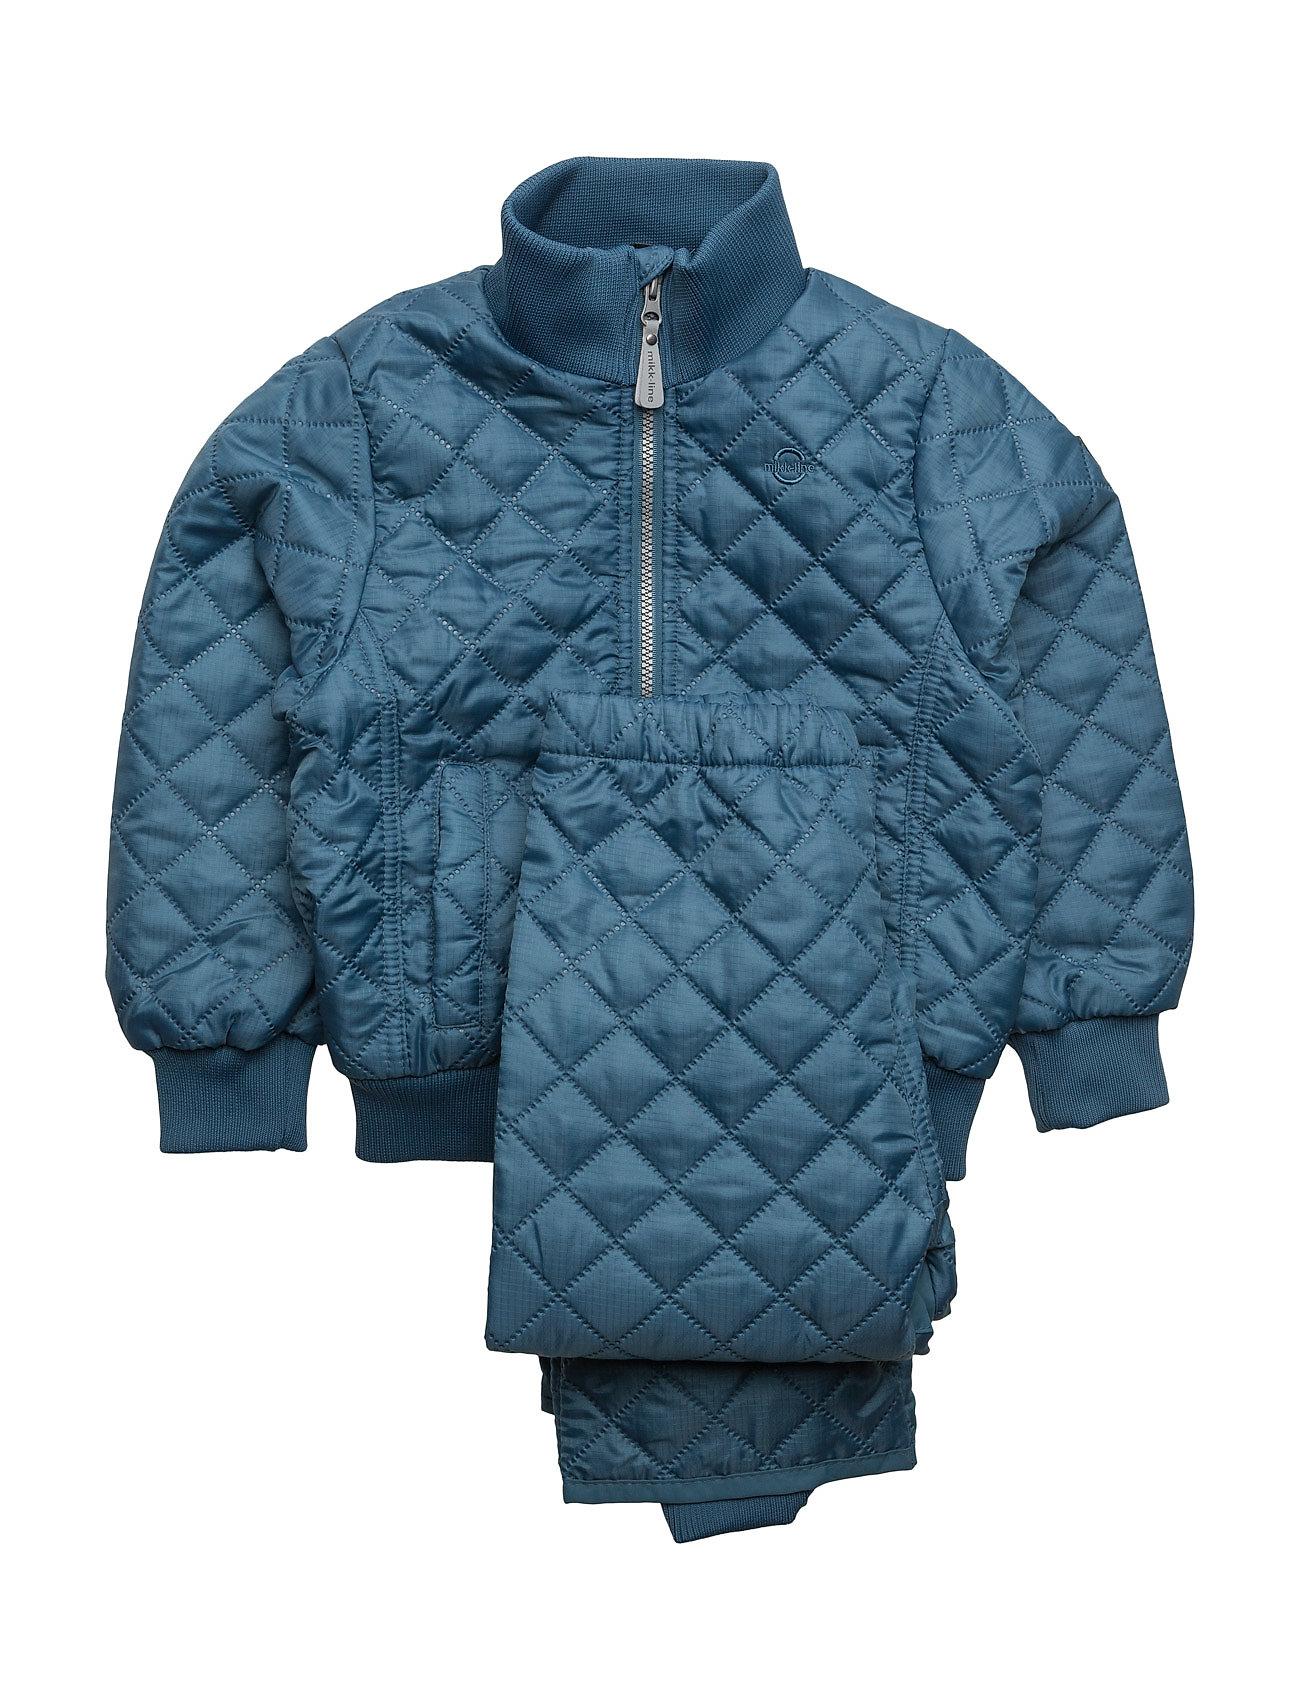 Basic Thermo Set W. Fleece Mikk-Line Thermo & Softshells til Børn i